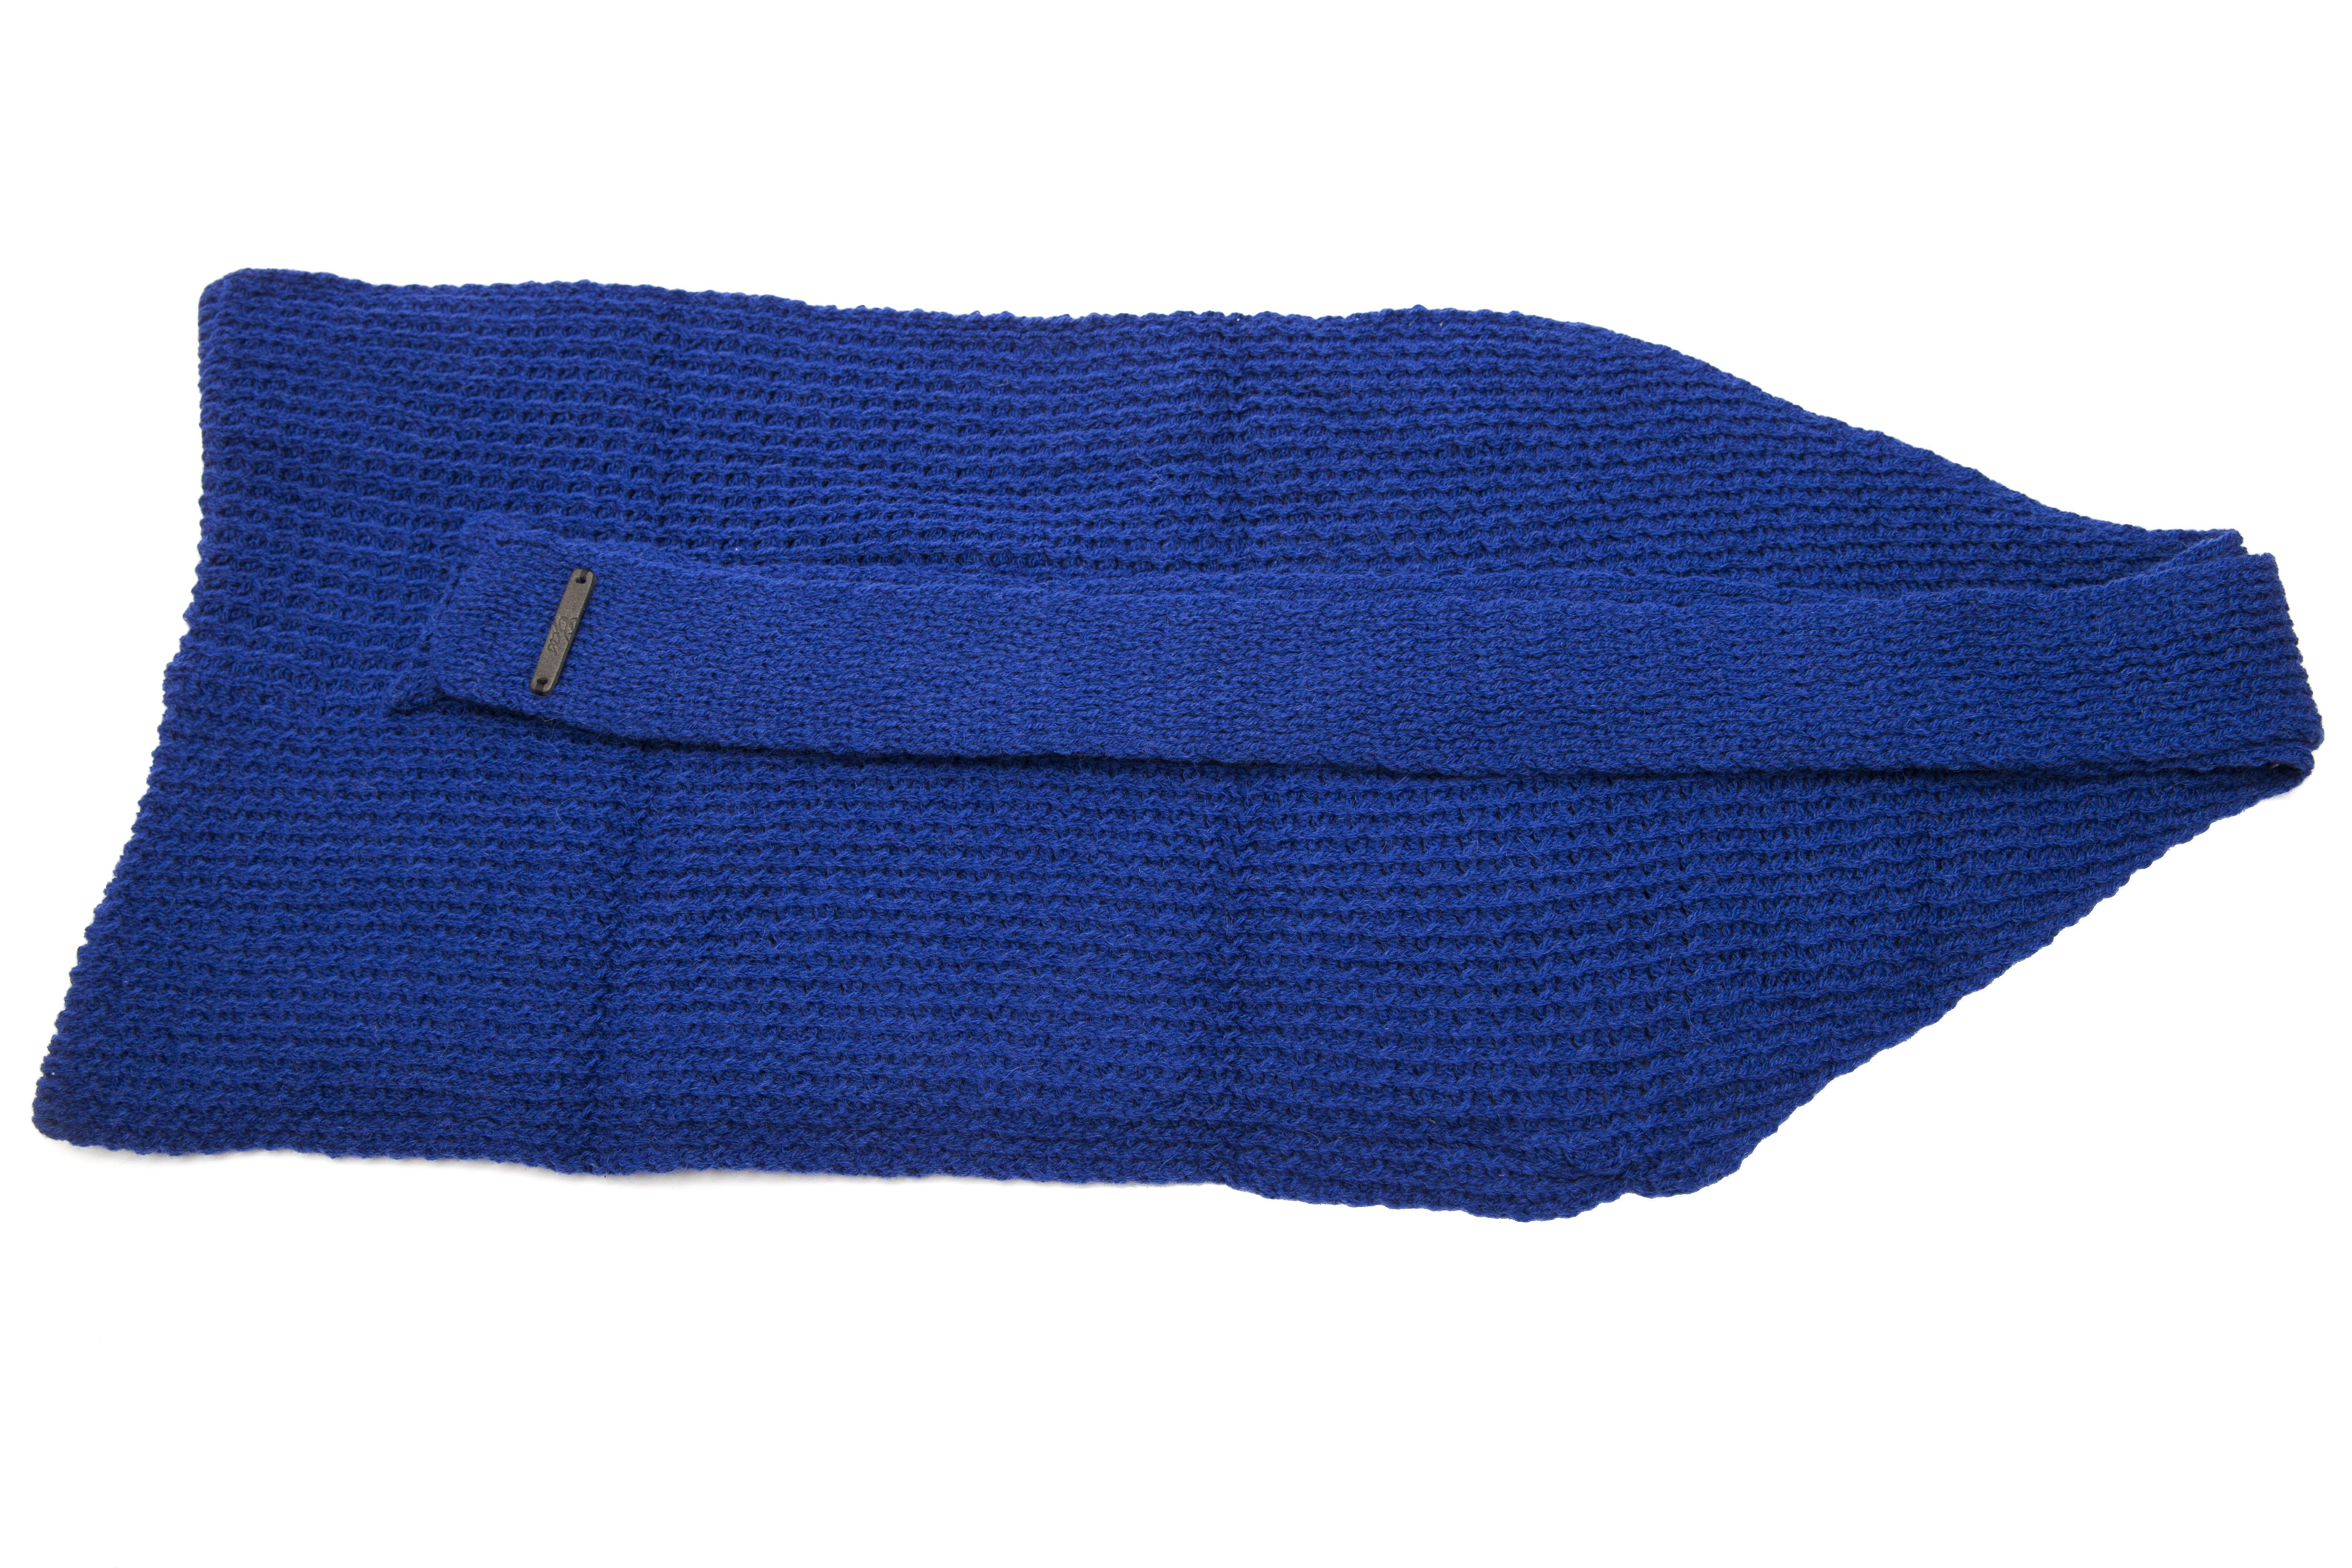 Gas Femme Bleu Gas Accessoires Bleu Vally Accessoires KcTF1lJ